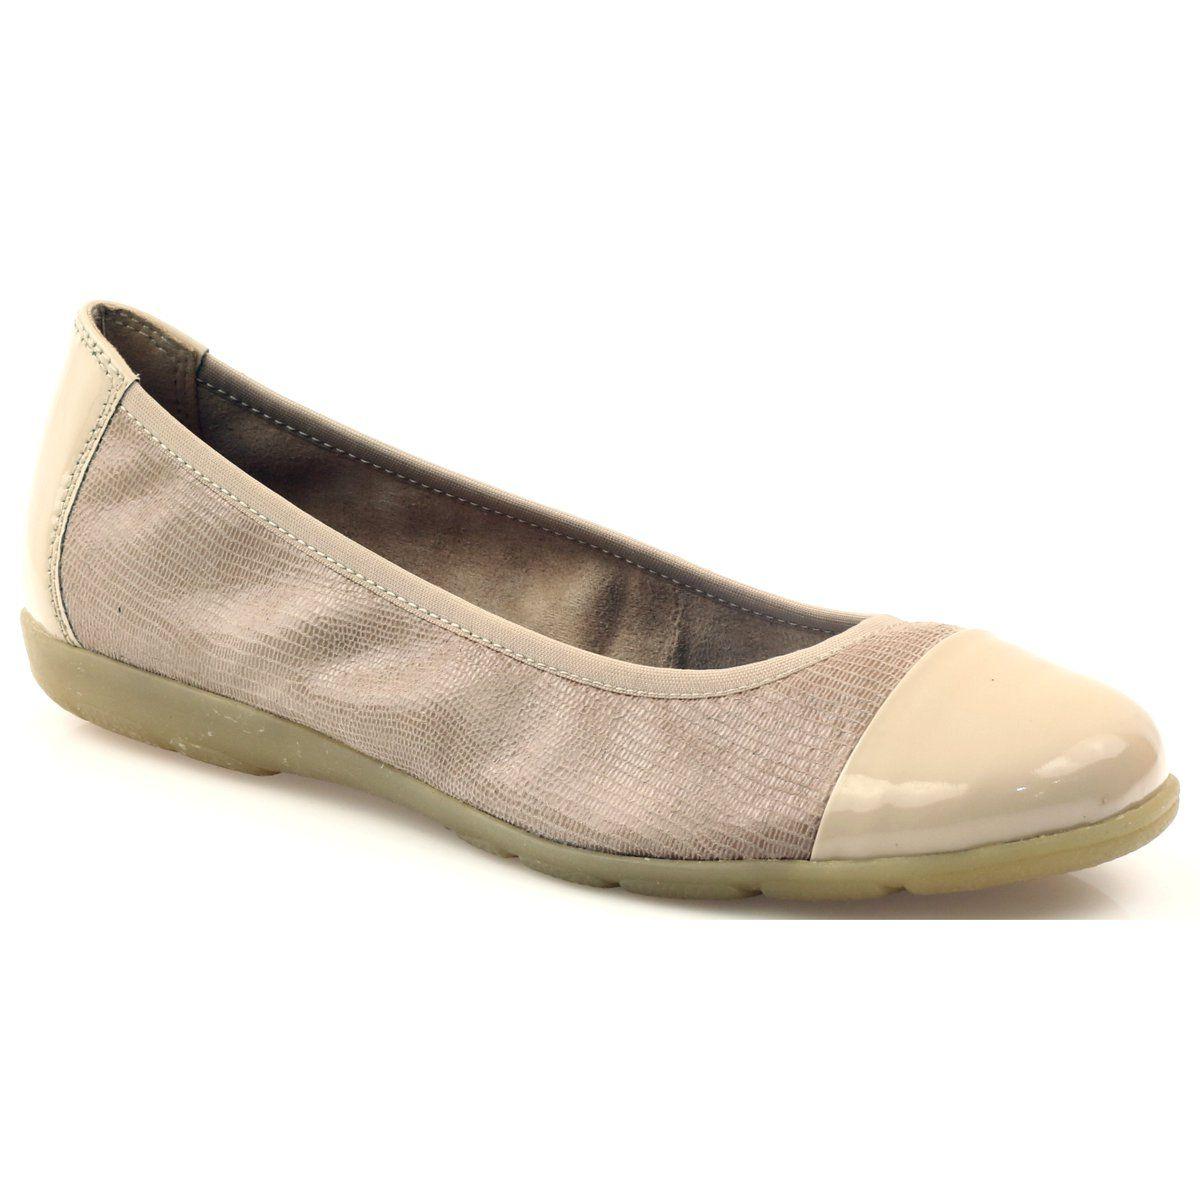 Balerinki Damskie Caprice Brazowe Balerinki Lakierowany Nosek Caprice 22152 Shoes Flats Fashion